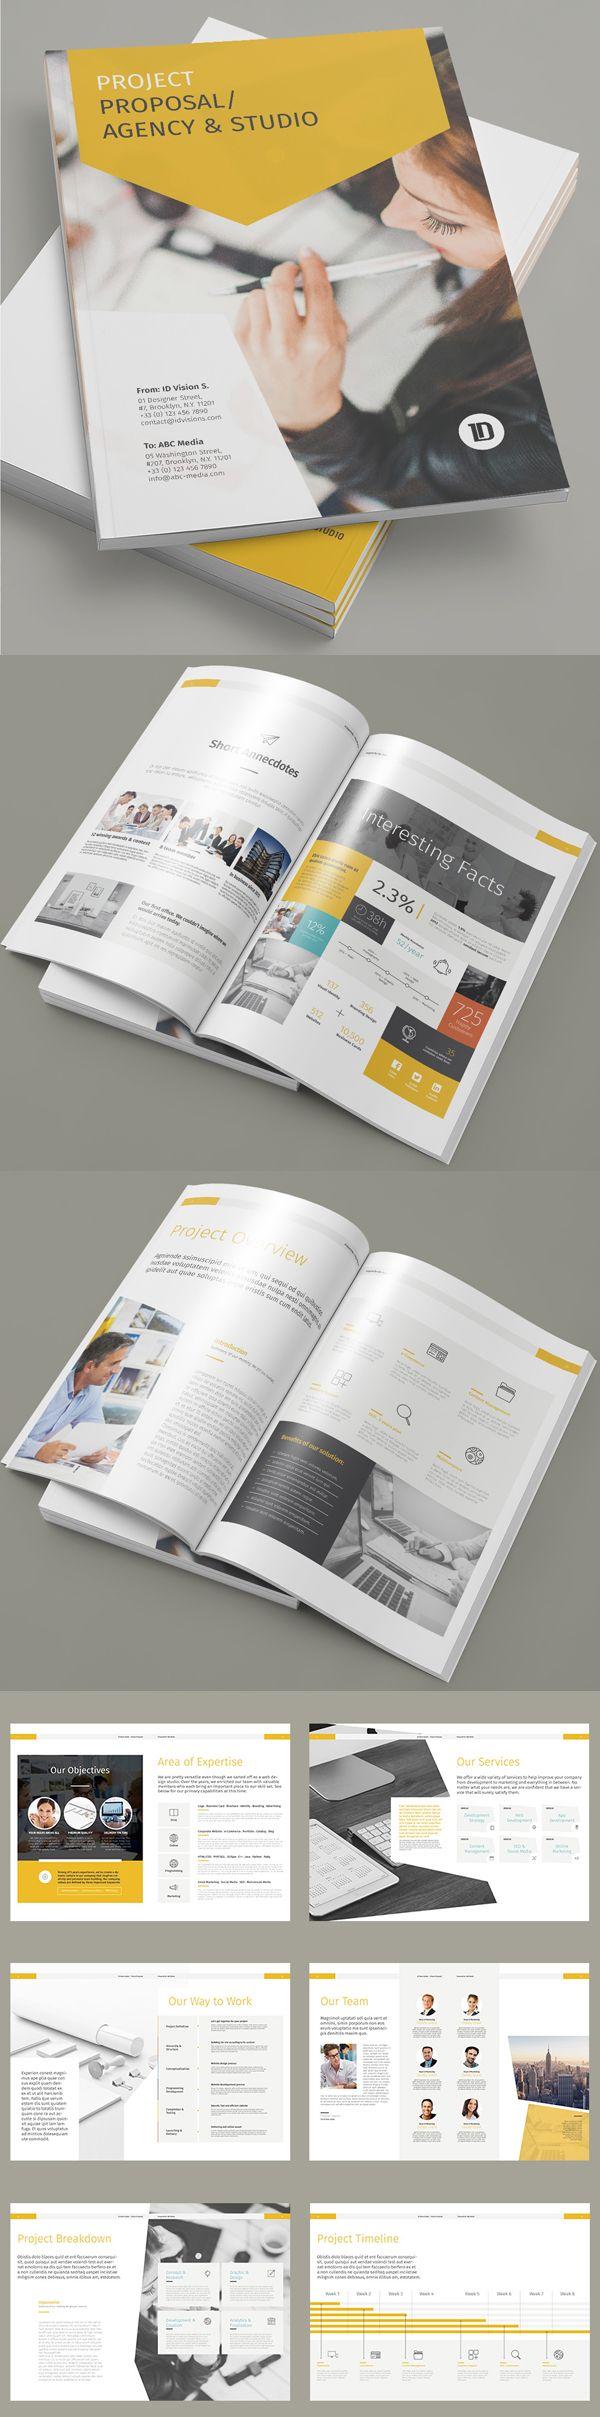 Project Proposal Brochure Template #annualreport #booklet #brochuredesign #brochuretemplates #fashioncatalog #catalogdesign